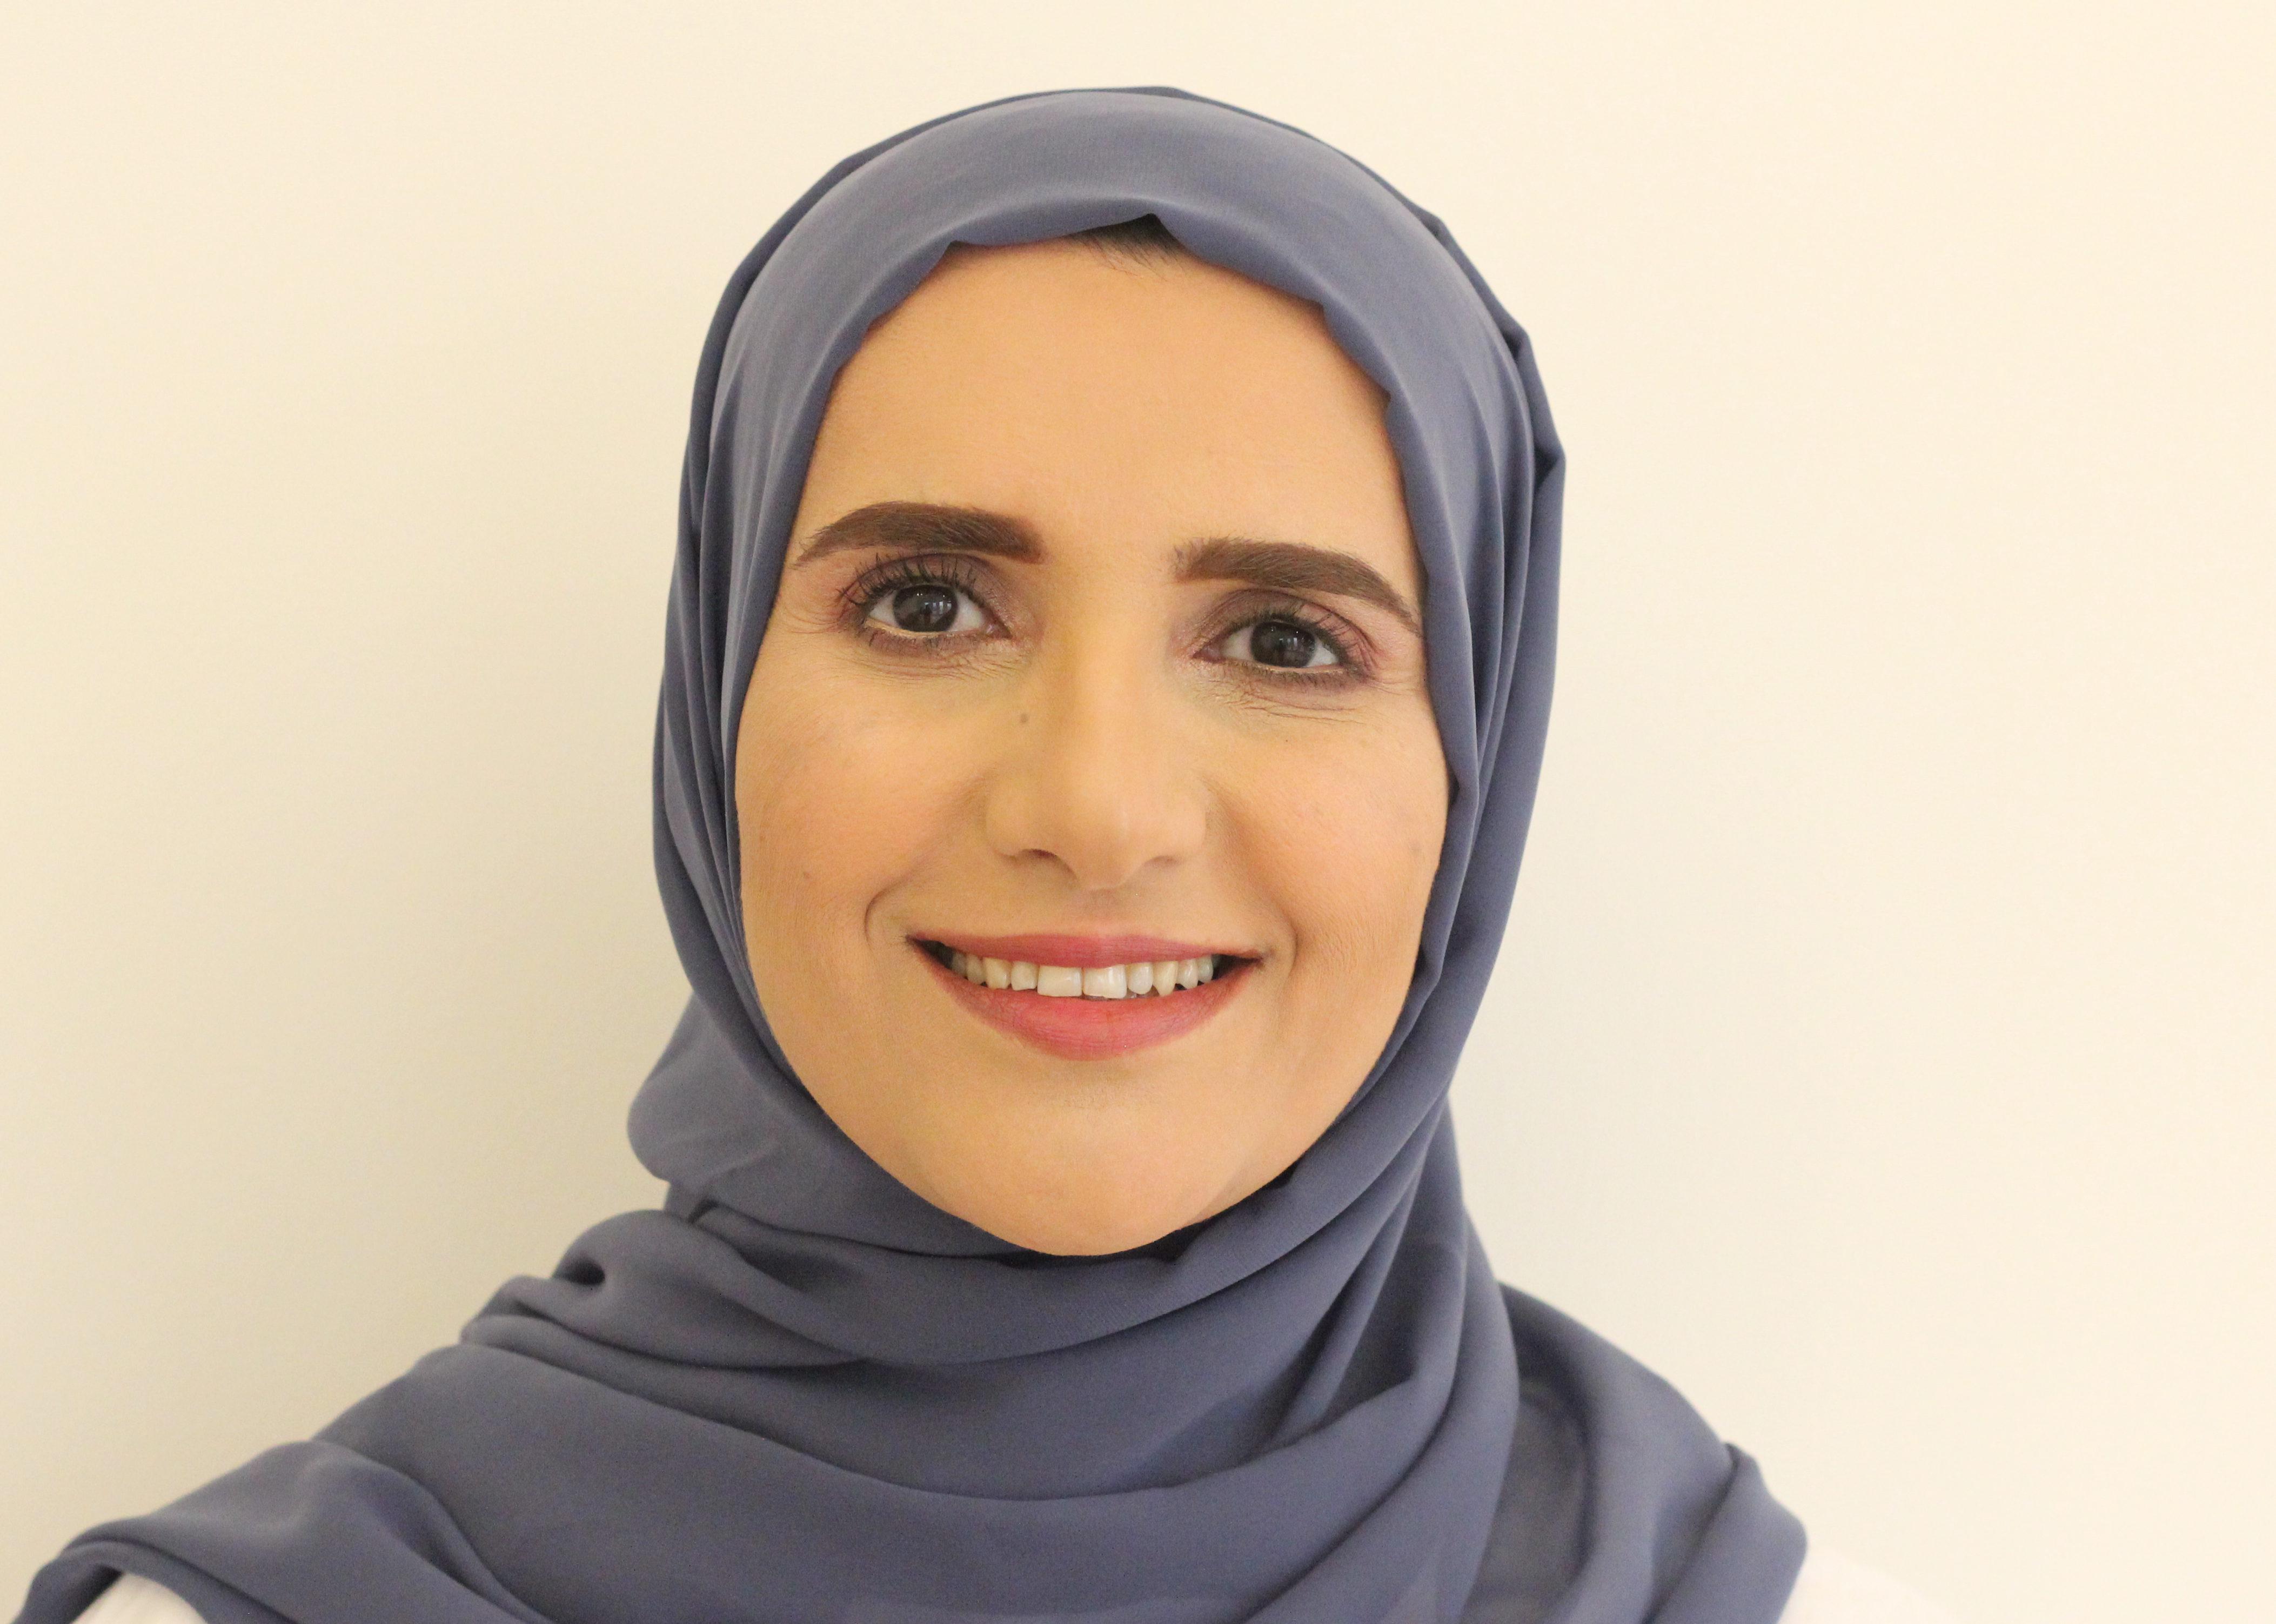 Man Booker International Prize winner, Jokha Alharthi